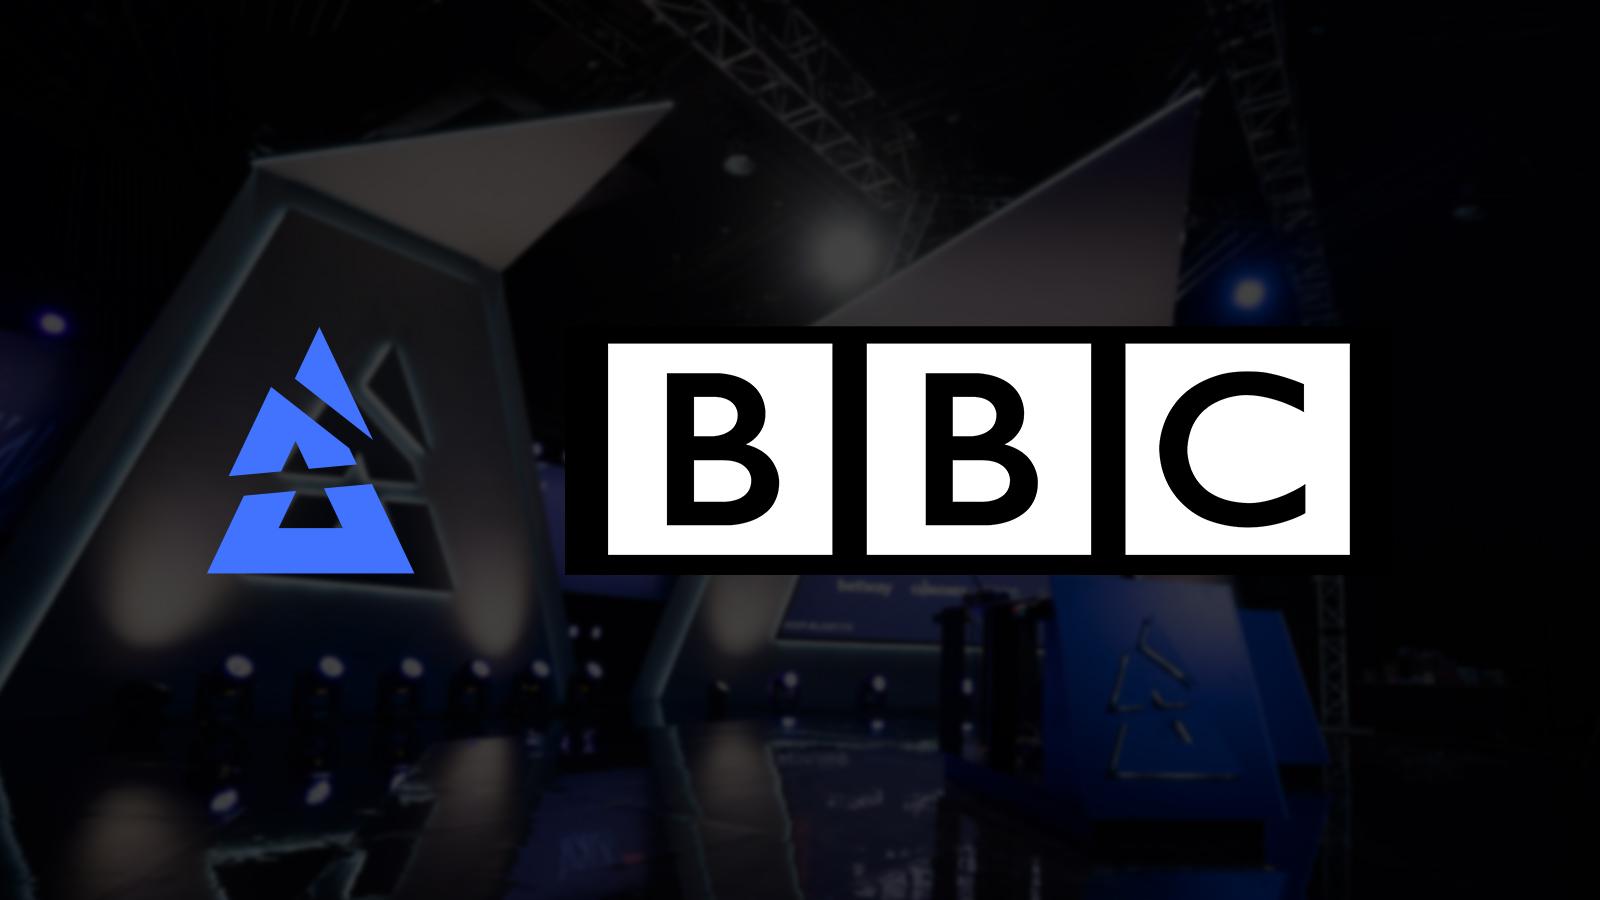 BLAST Premier to be broadcast on BBC iPlayer